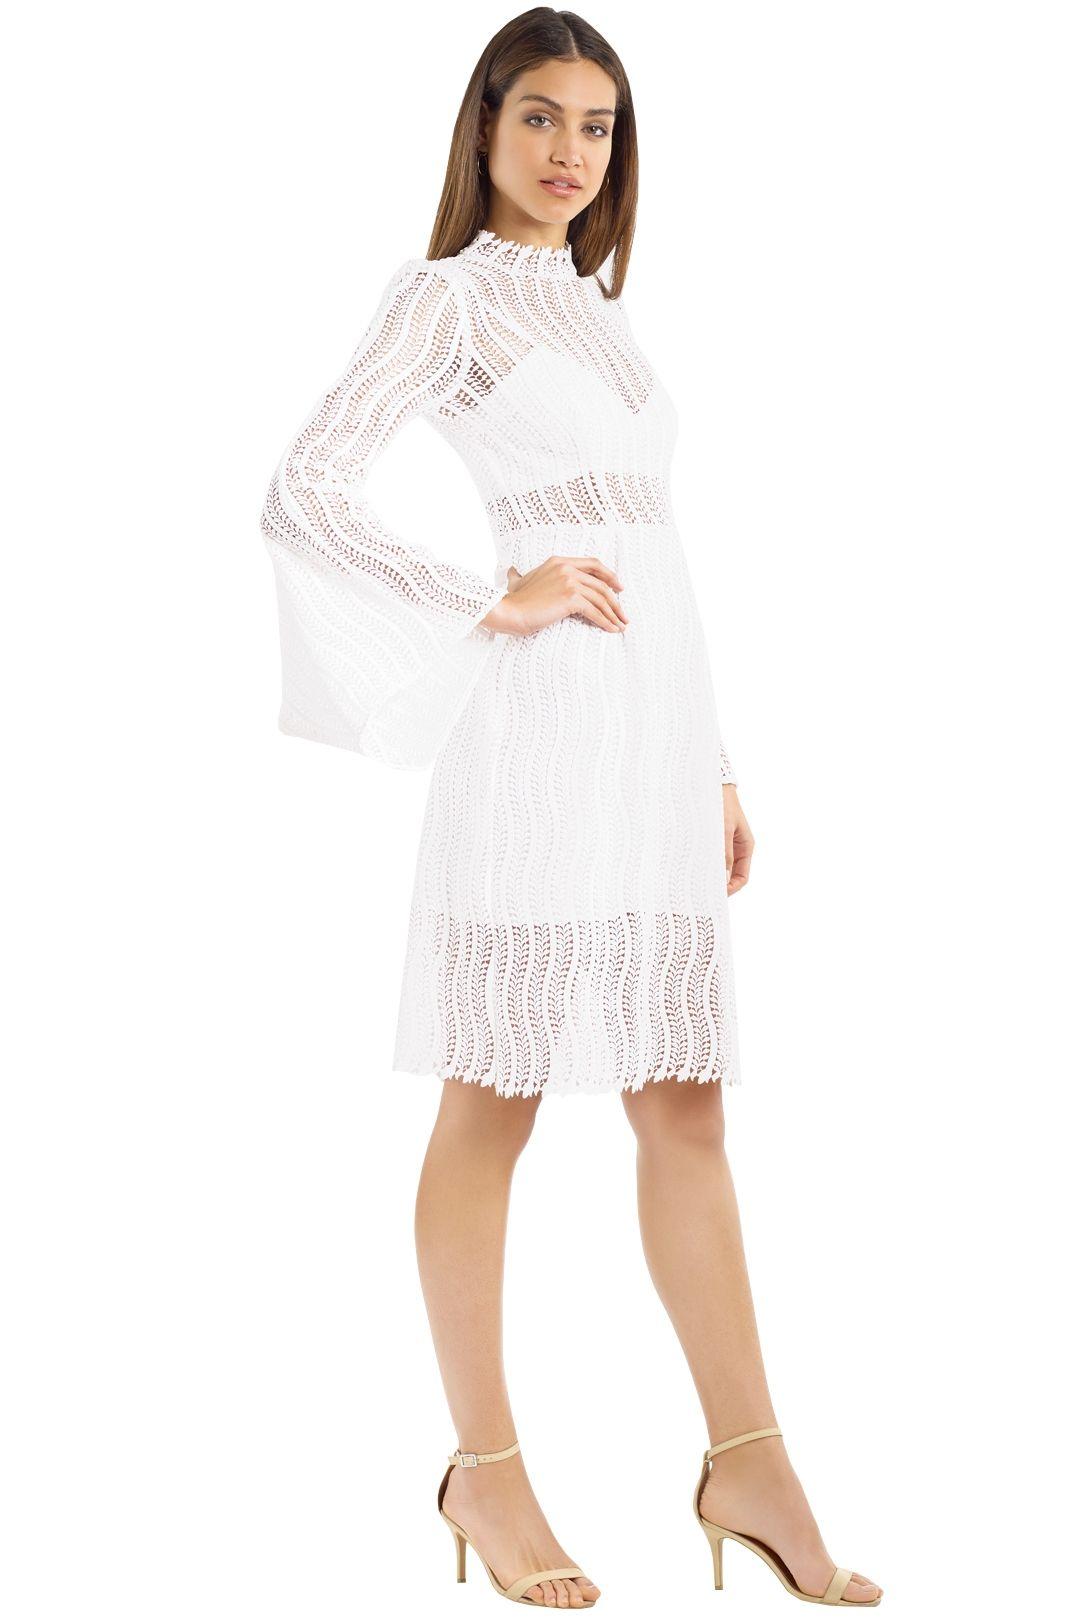 Yeojin Bae - Caterina Dress - Cream - Side